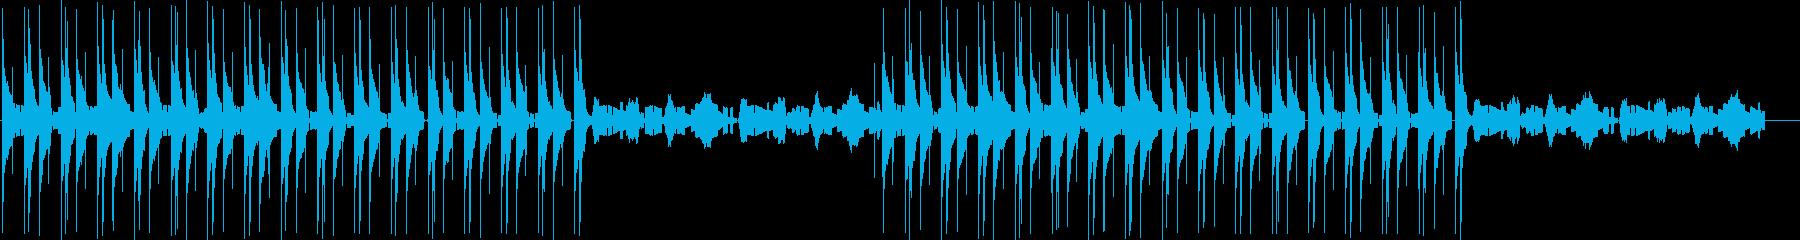 Lo-Fiな音色のエレクトロの再生済みの波形